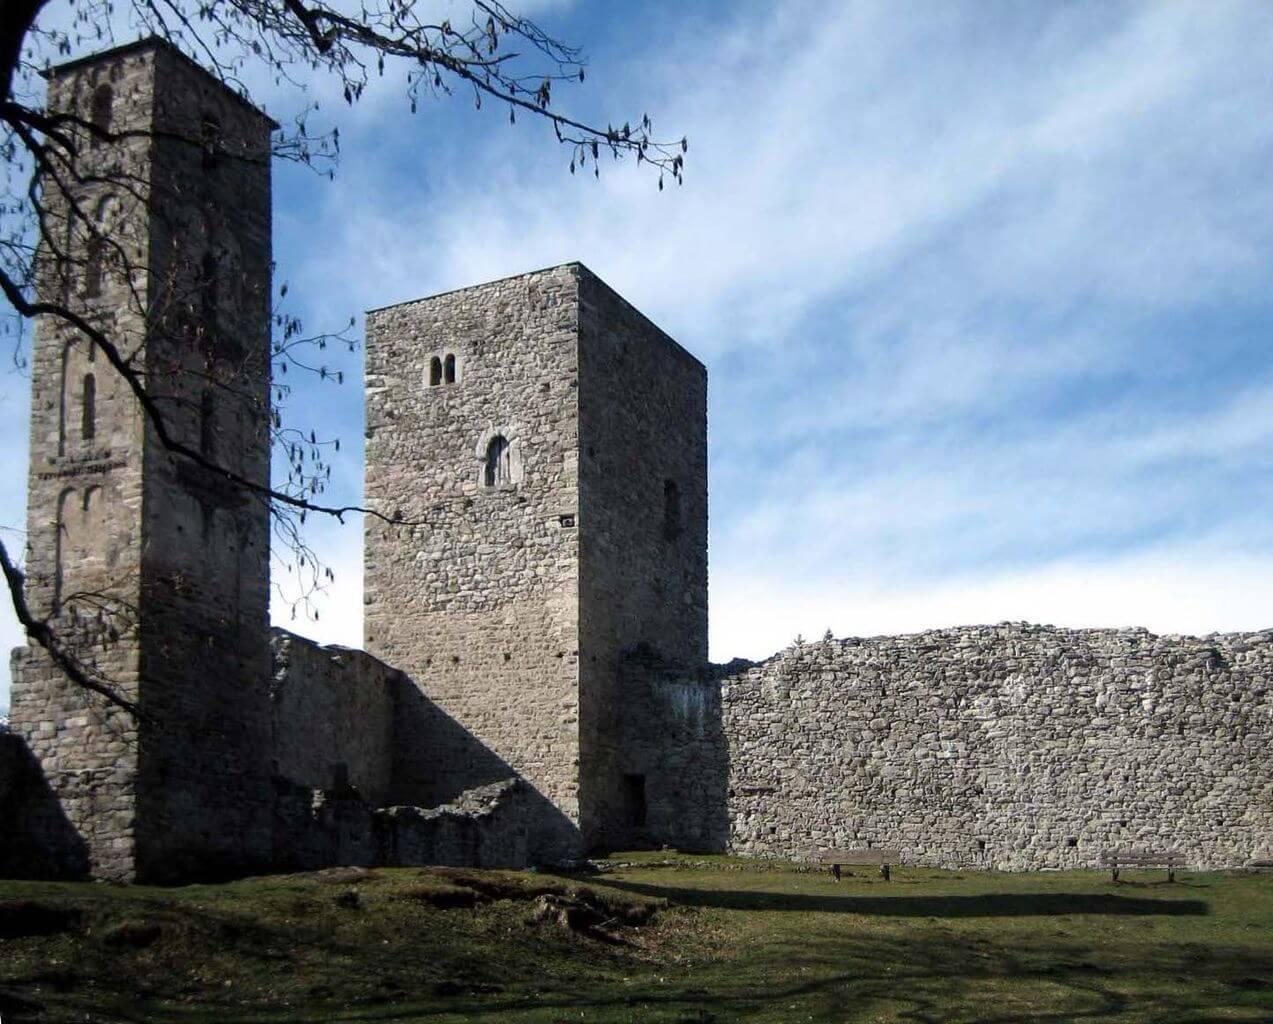 Innenhof von Schloss Jörgenberg.